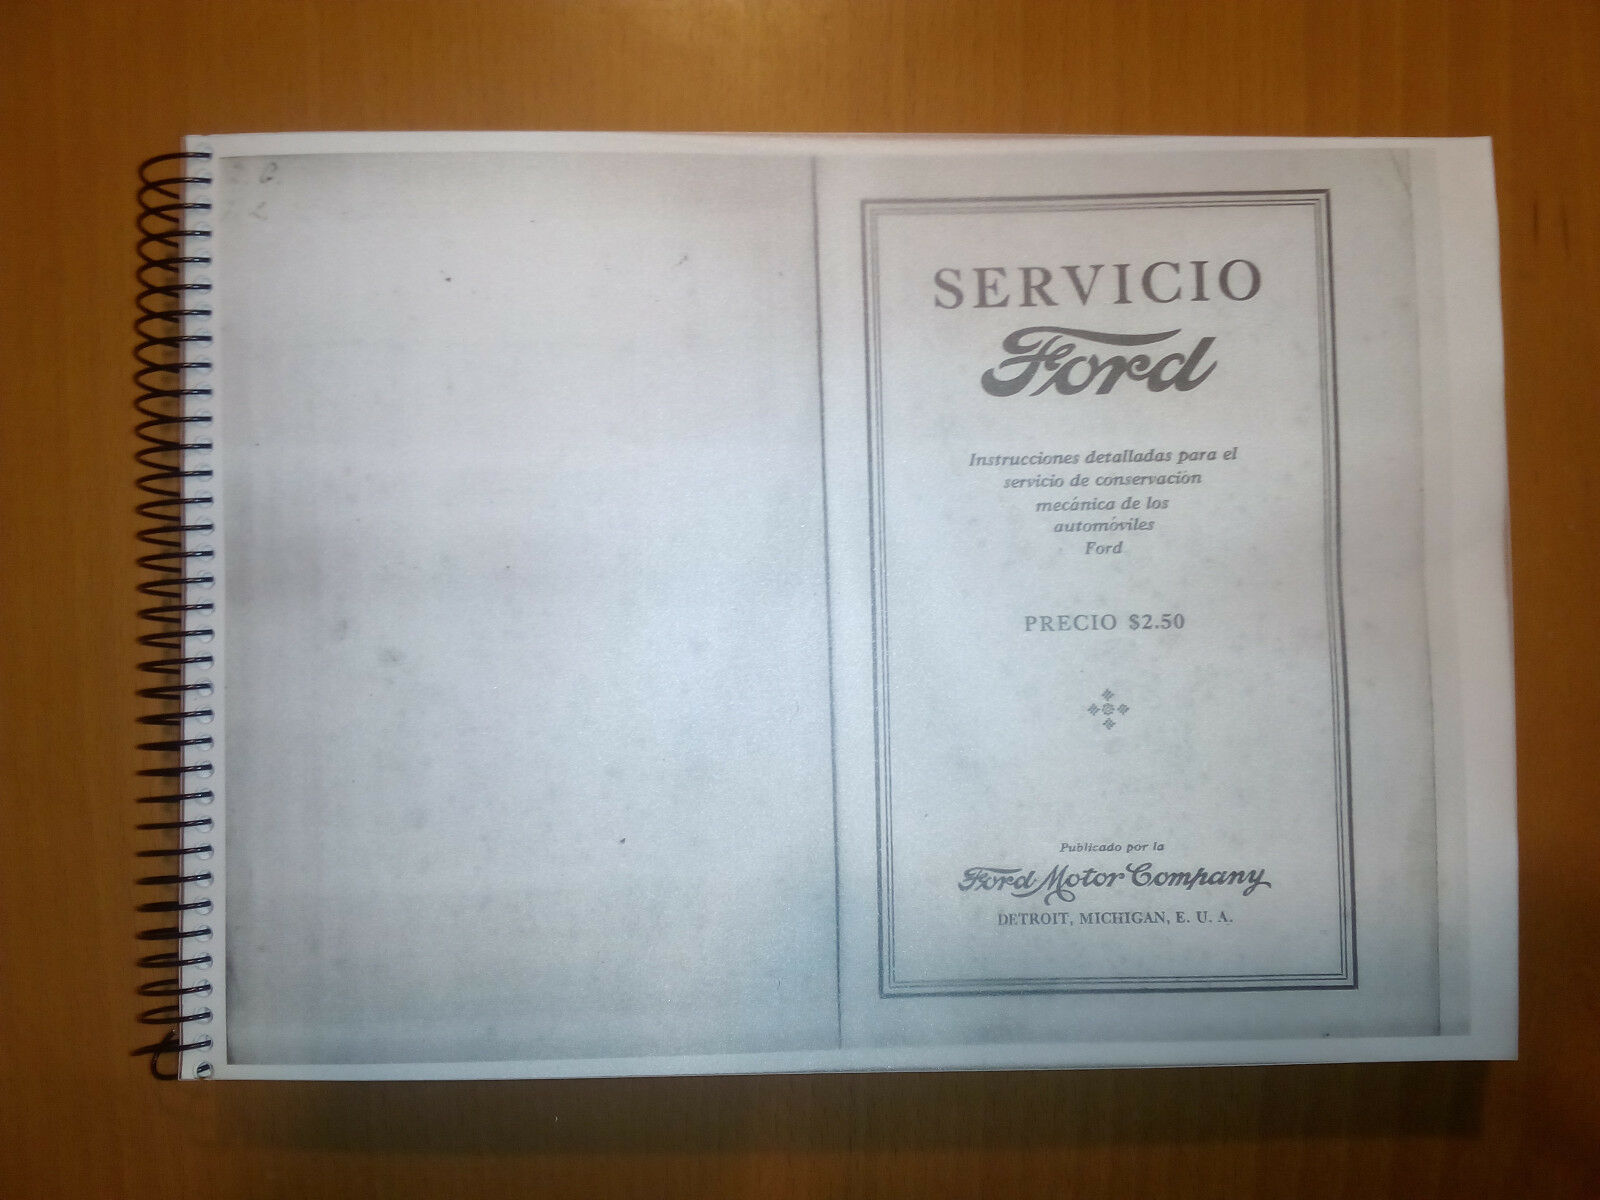 Pleasing Workshop Manual Ford Model T All In Spanish Ford 1927 Oqflnd8403 Wiring Cloud Scatahouseofspiritnl